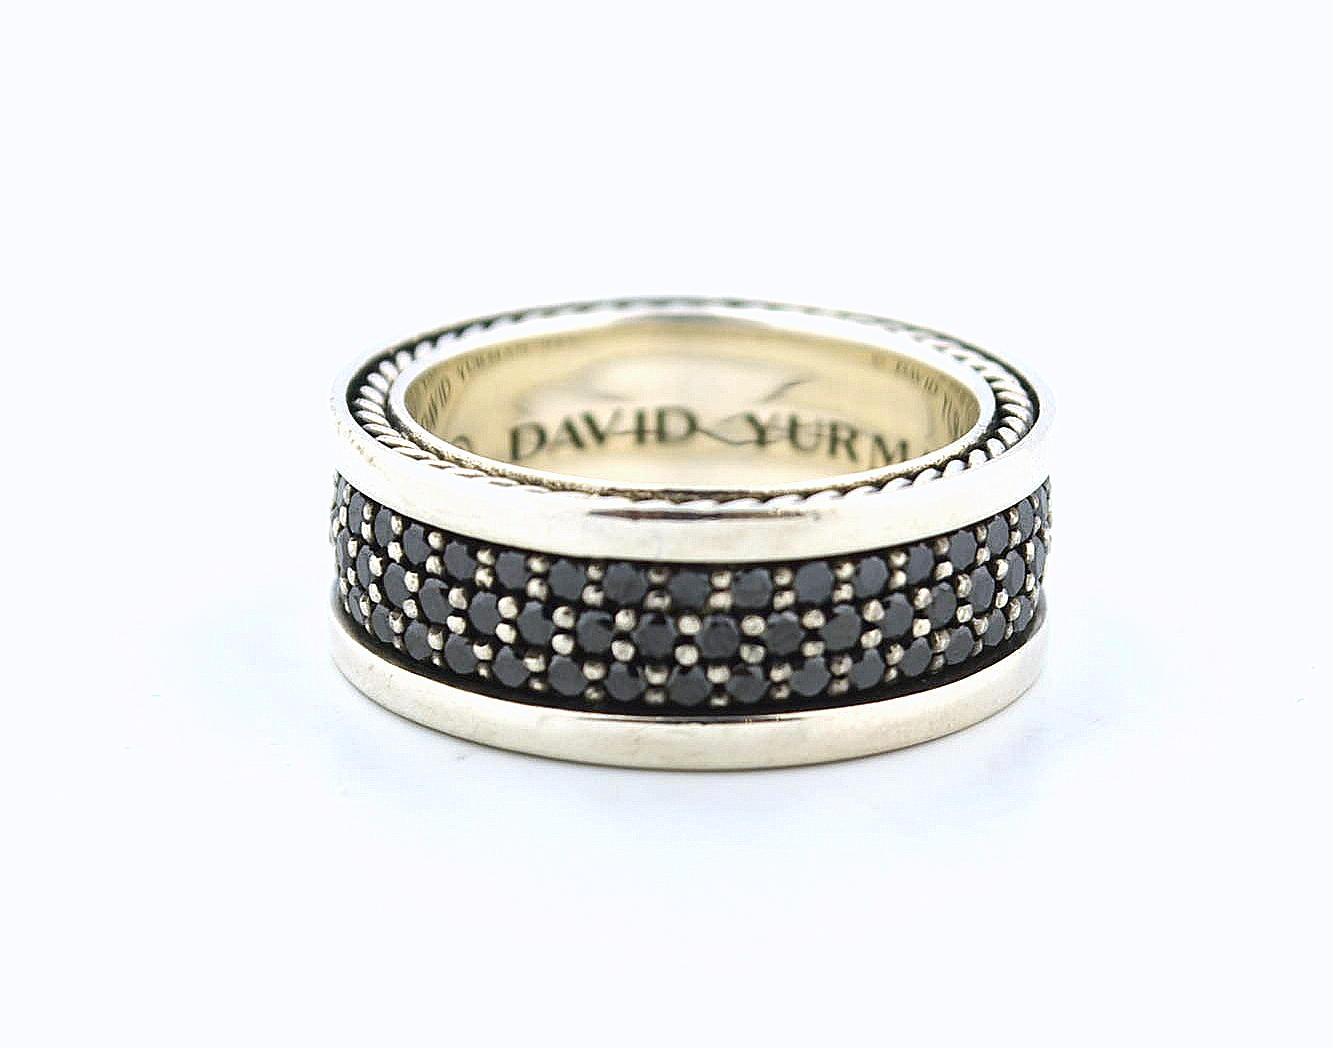 mens david yurman wedding band sterling silver wallpaper - David Yurman Mens Wedding Rings